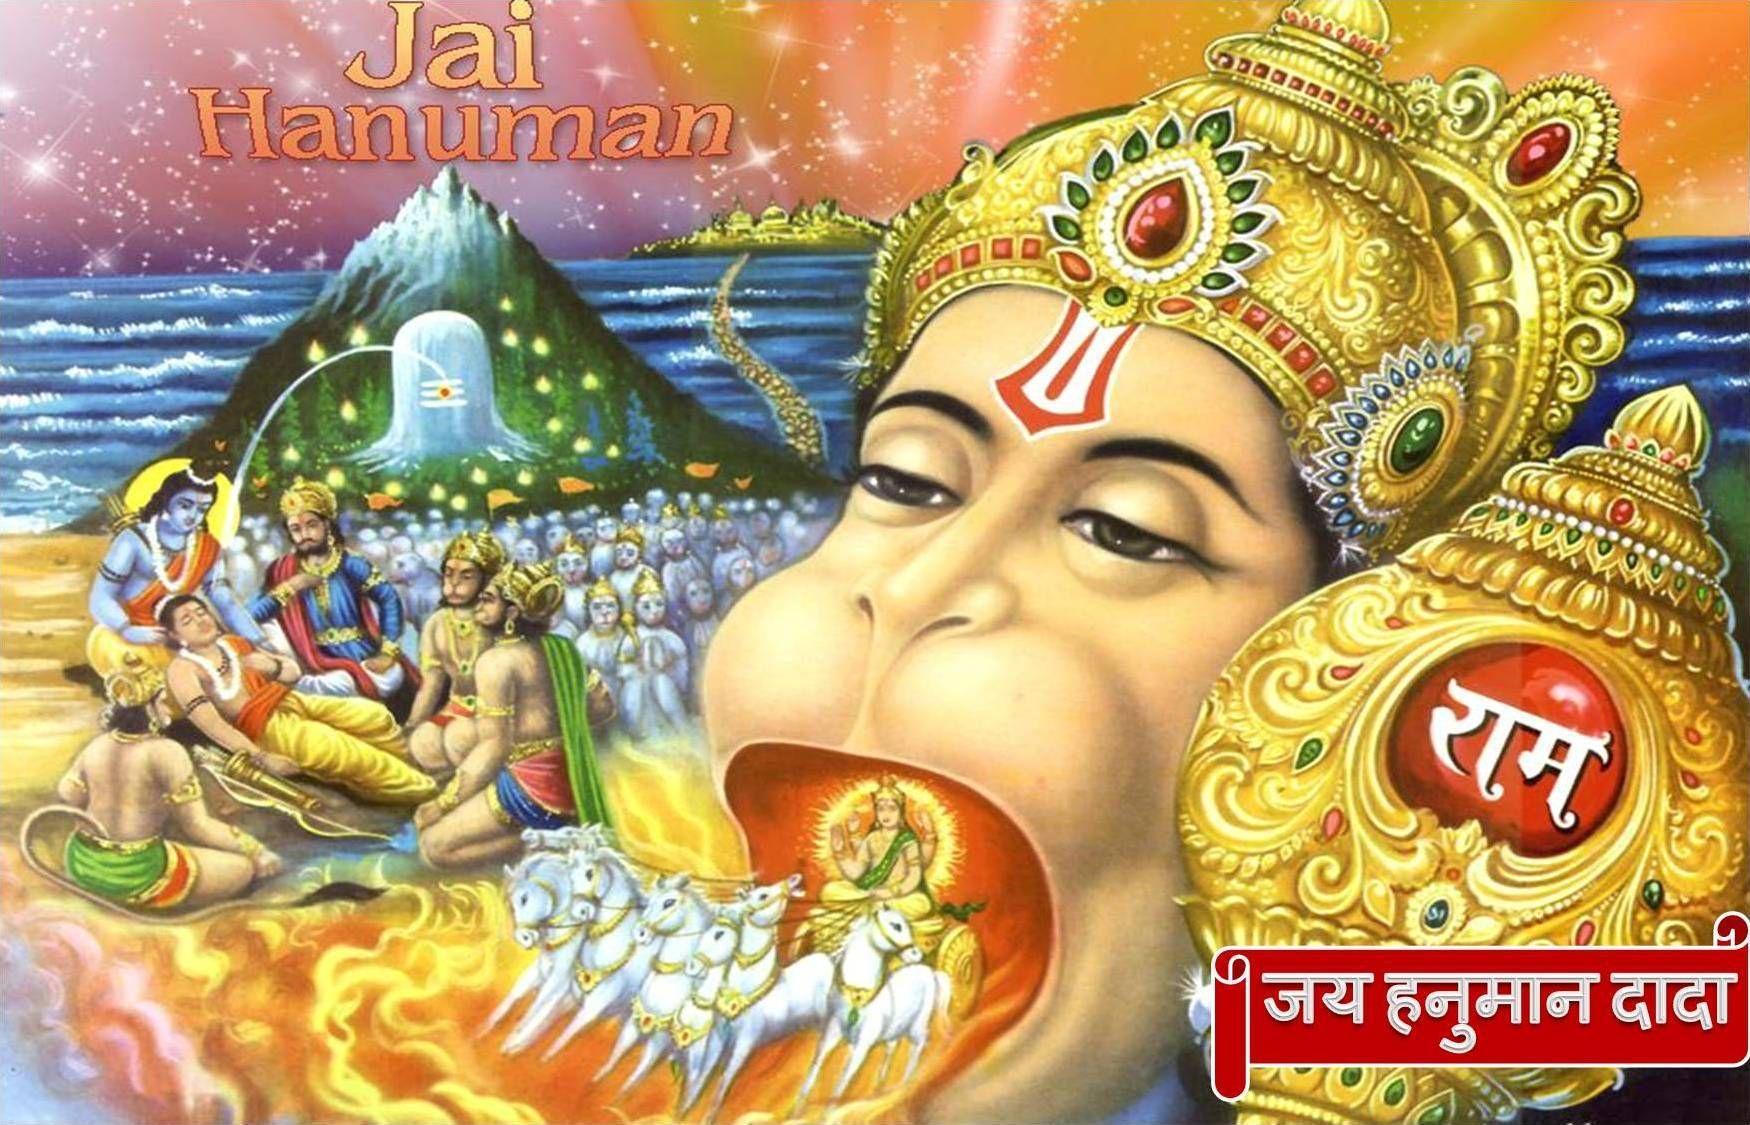 In India S Greatest Epic Ramayana During Ram Ravan War In Lanka When Meghnad Indrajeet The Son Of Lankap Hanuman Hanuman Wallpaper Lord Hanuman Wallpapers Ultra hd 1080p lord ravana hd wallpapers